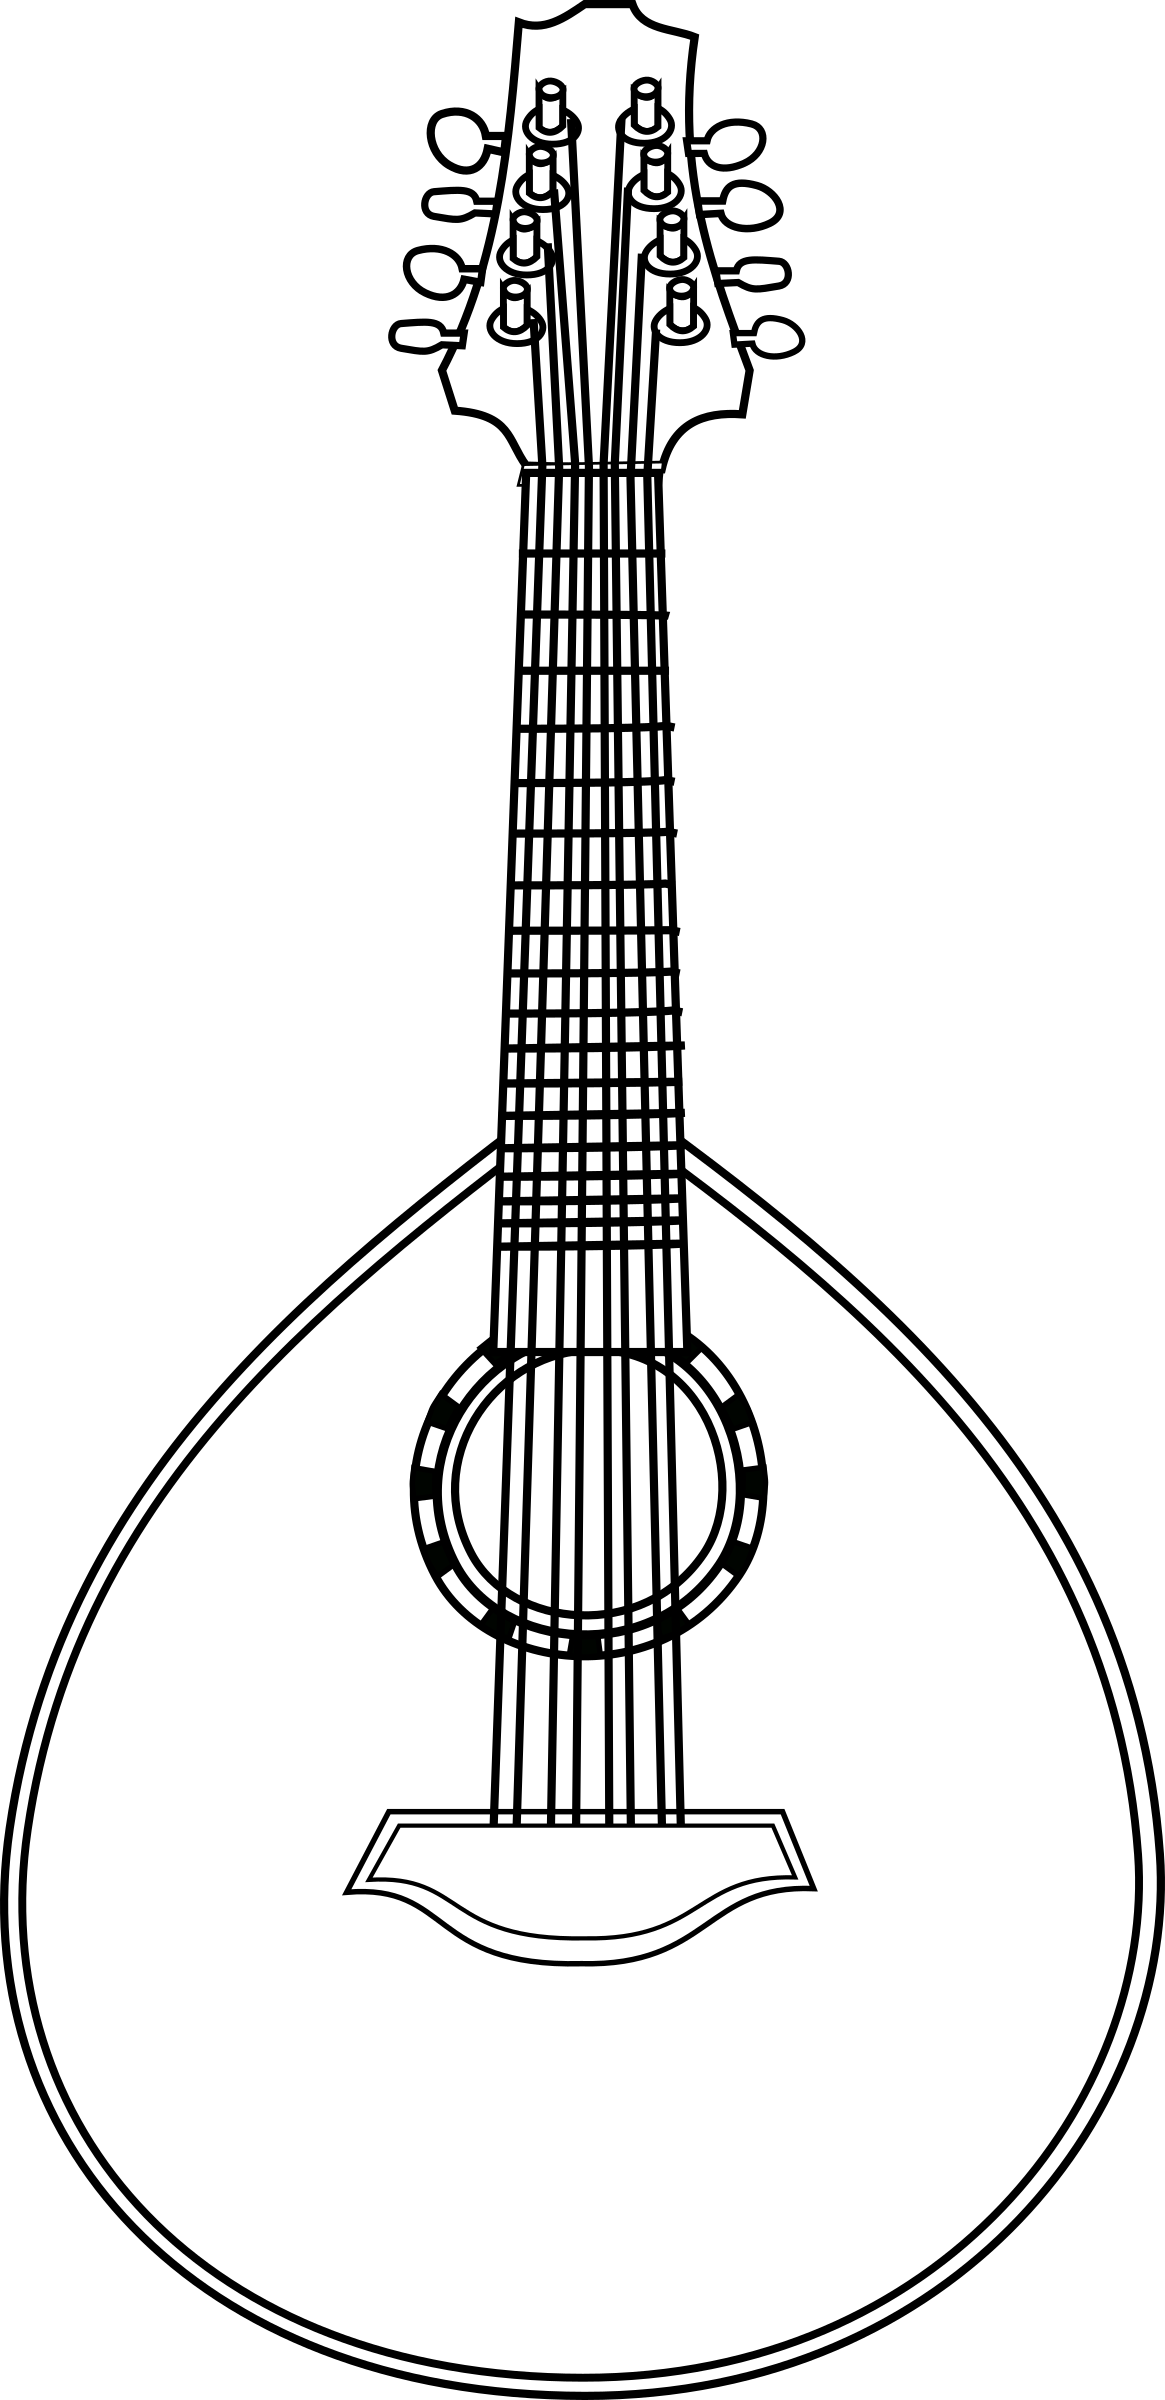 Lute big image png. Clipart guitar octavina